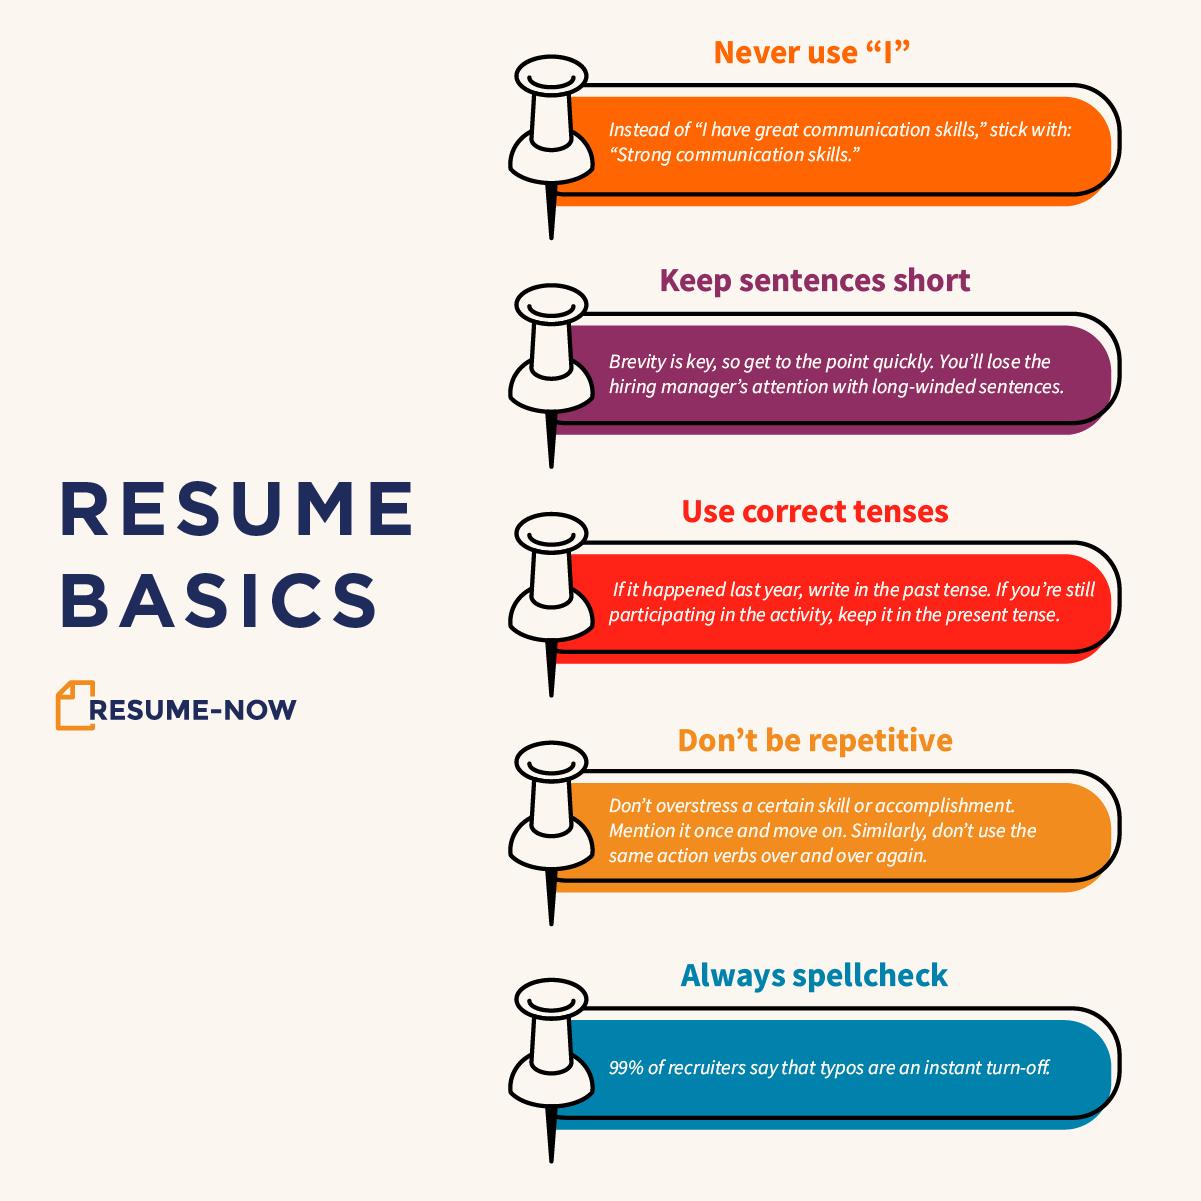 Resume basics Resume, Build a resume, Free resume builder